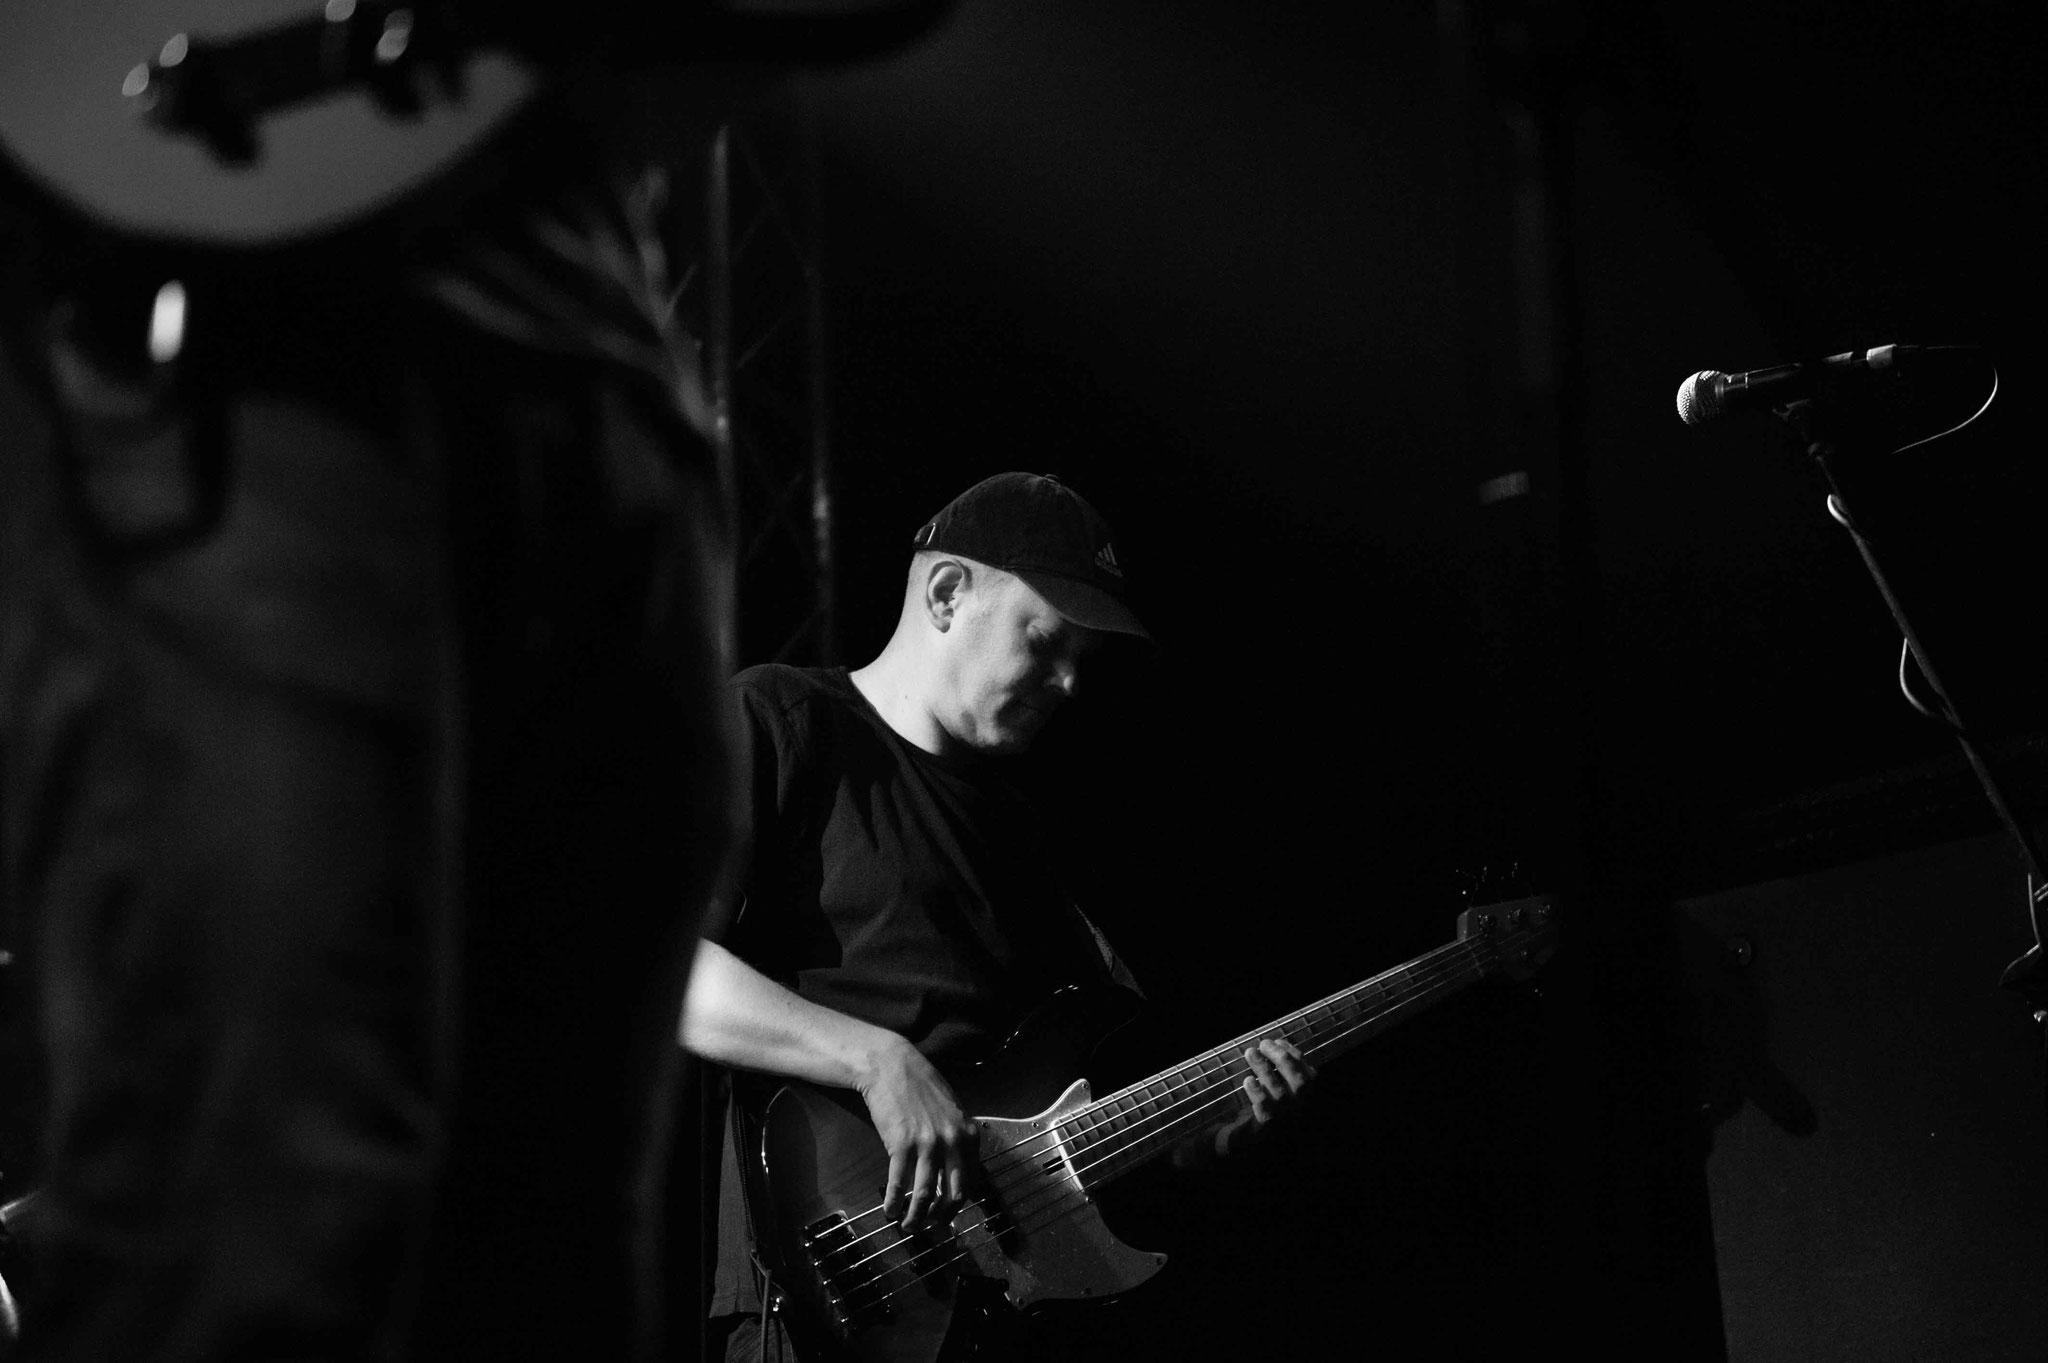 © Lauri Mertala 2017